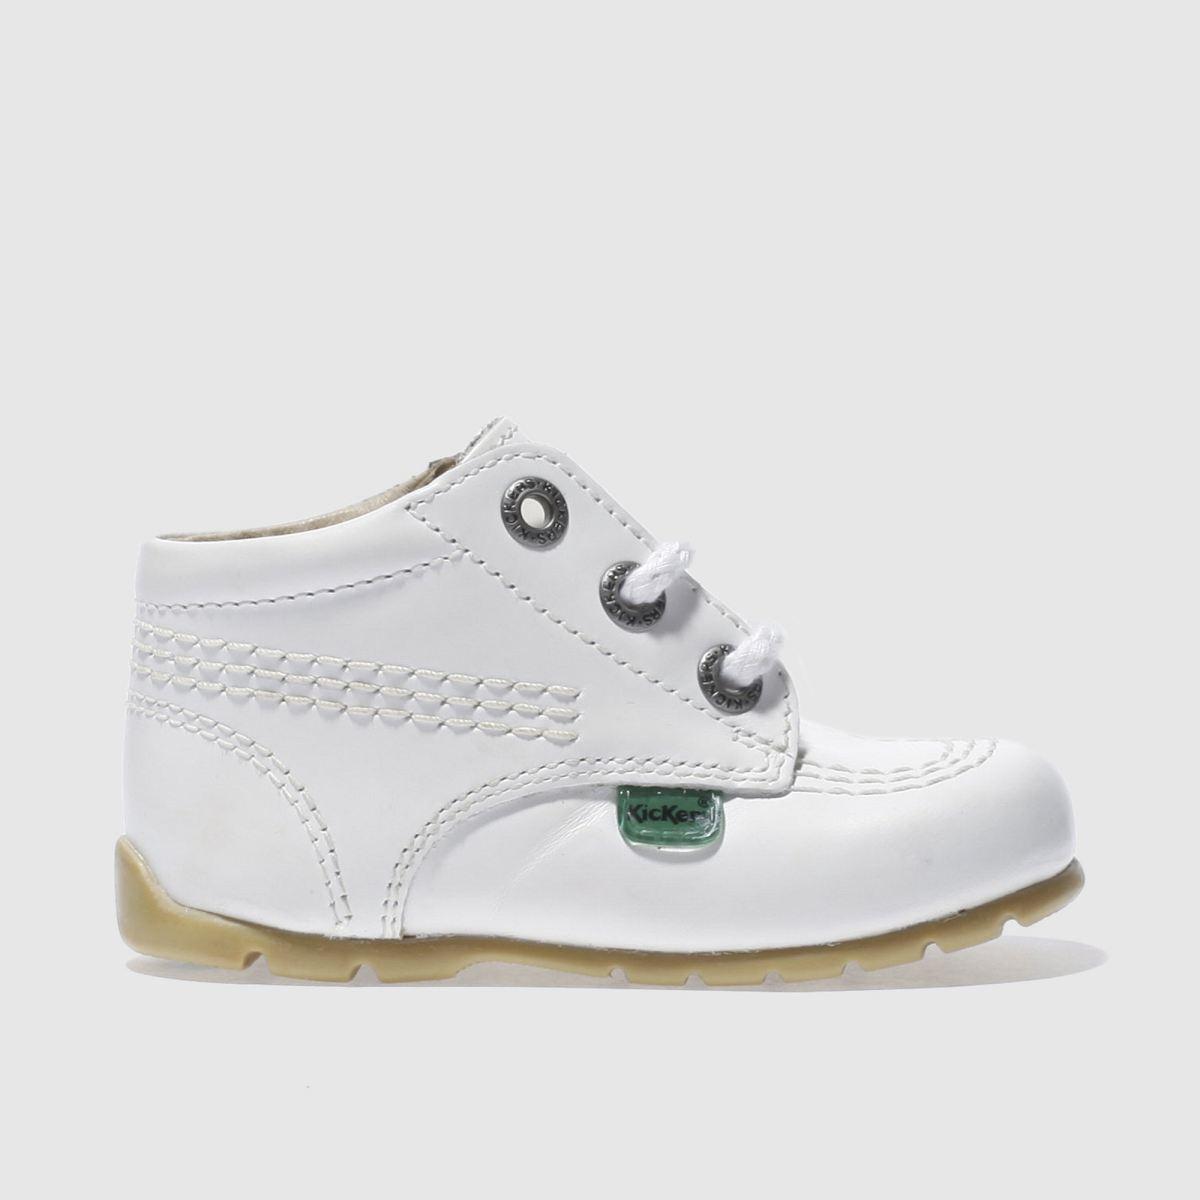 Kickers White Kick Hi Shoes Baby